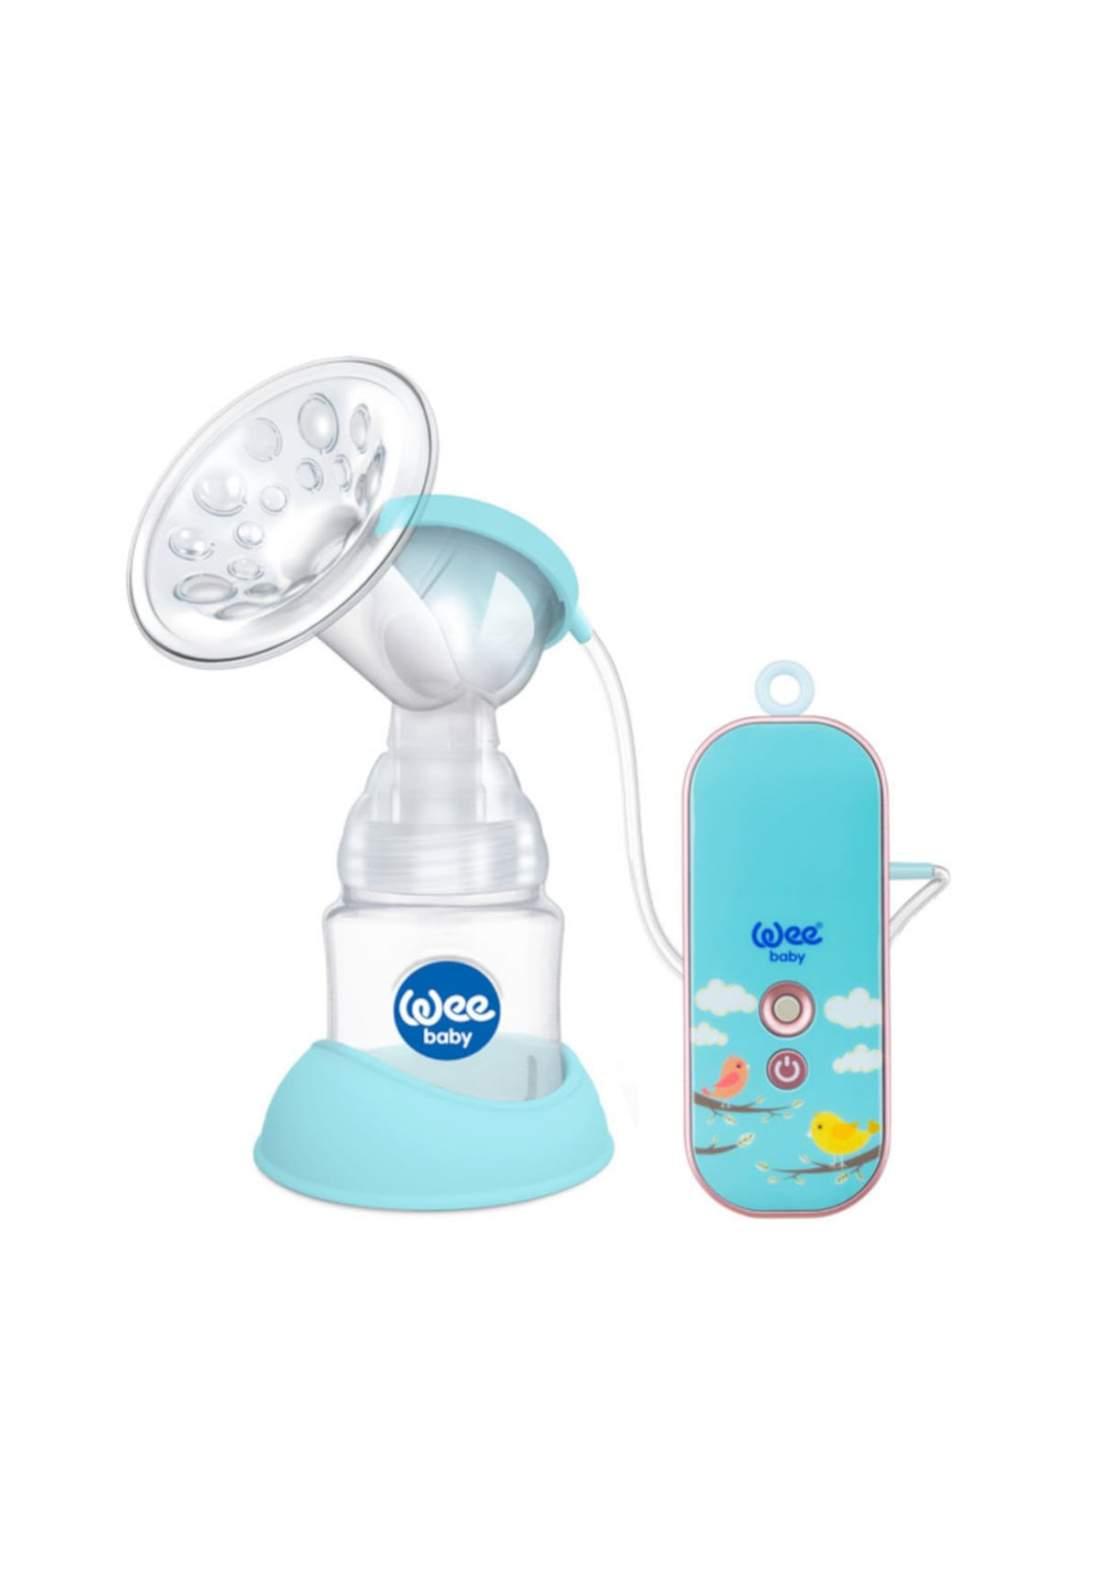 Wee Baby 168 Electronic Breast Pump شافطة حليب الالكترونية